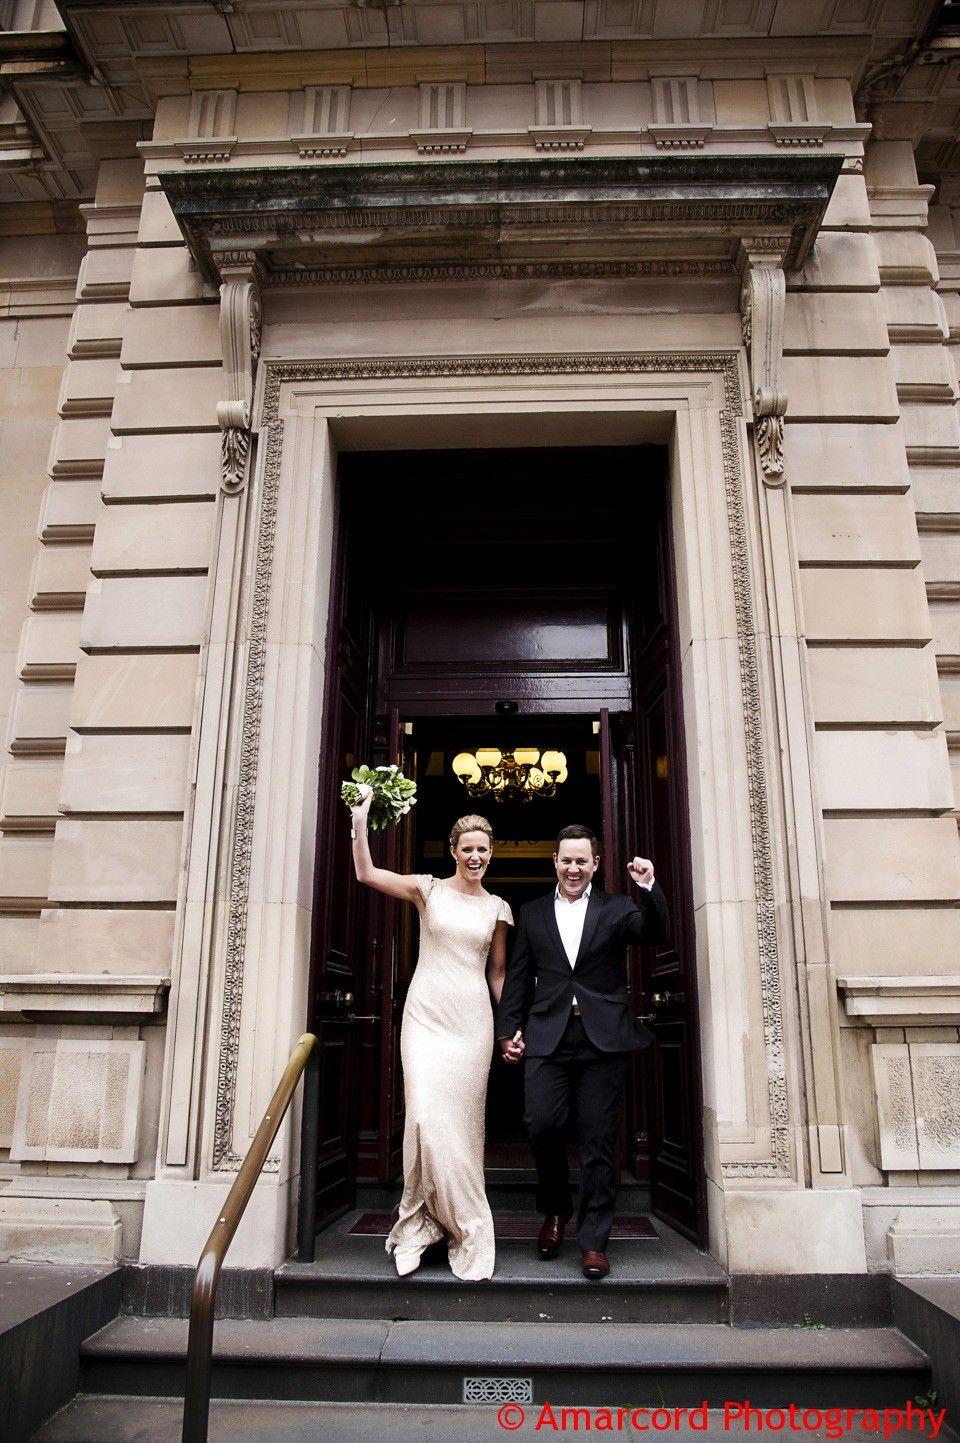 Elopement Destination Wedding in Melbourne St Peter